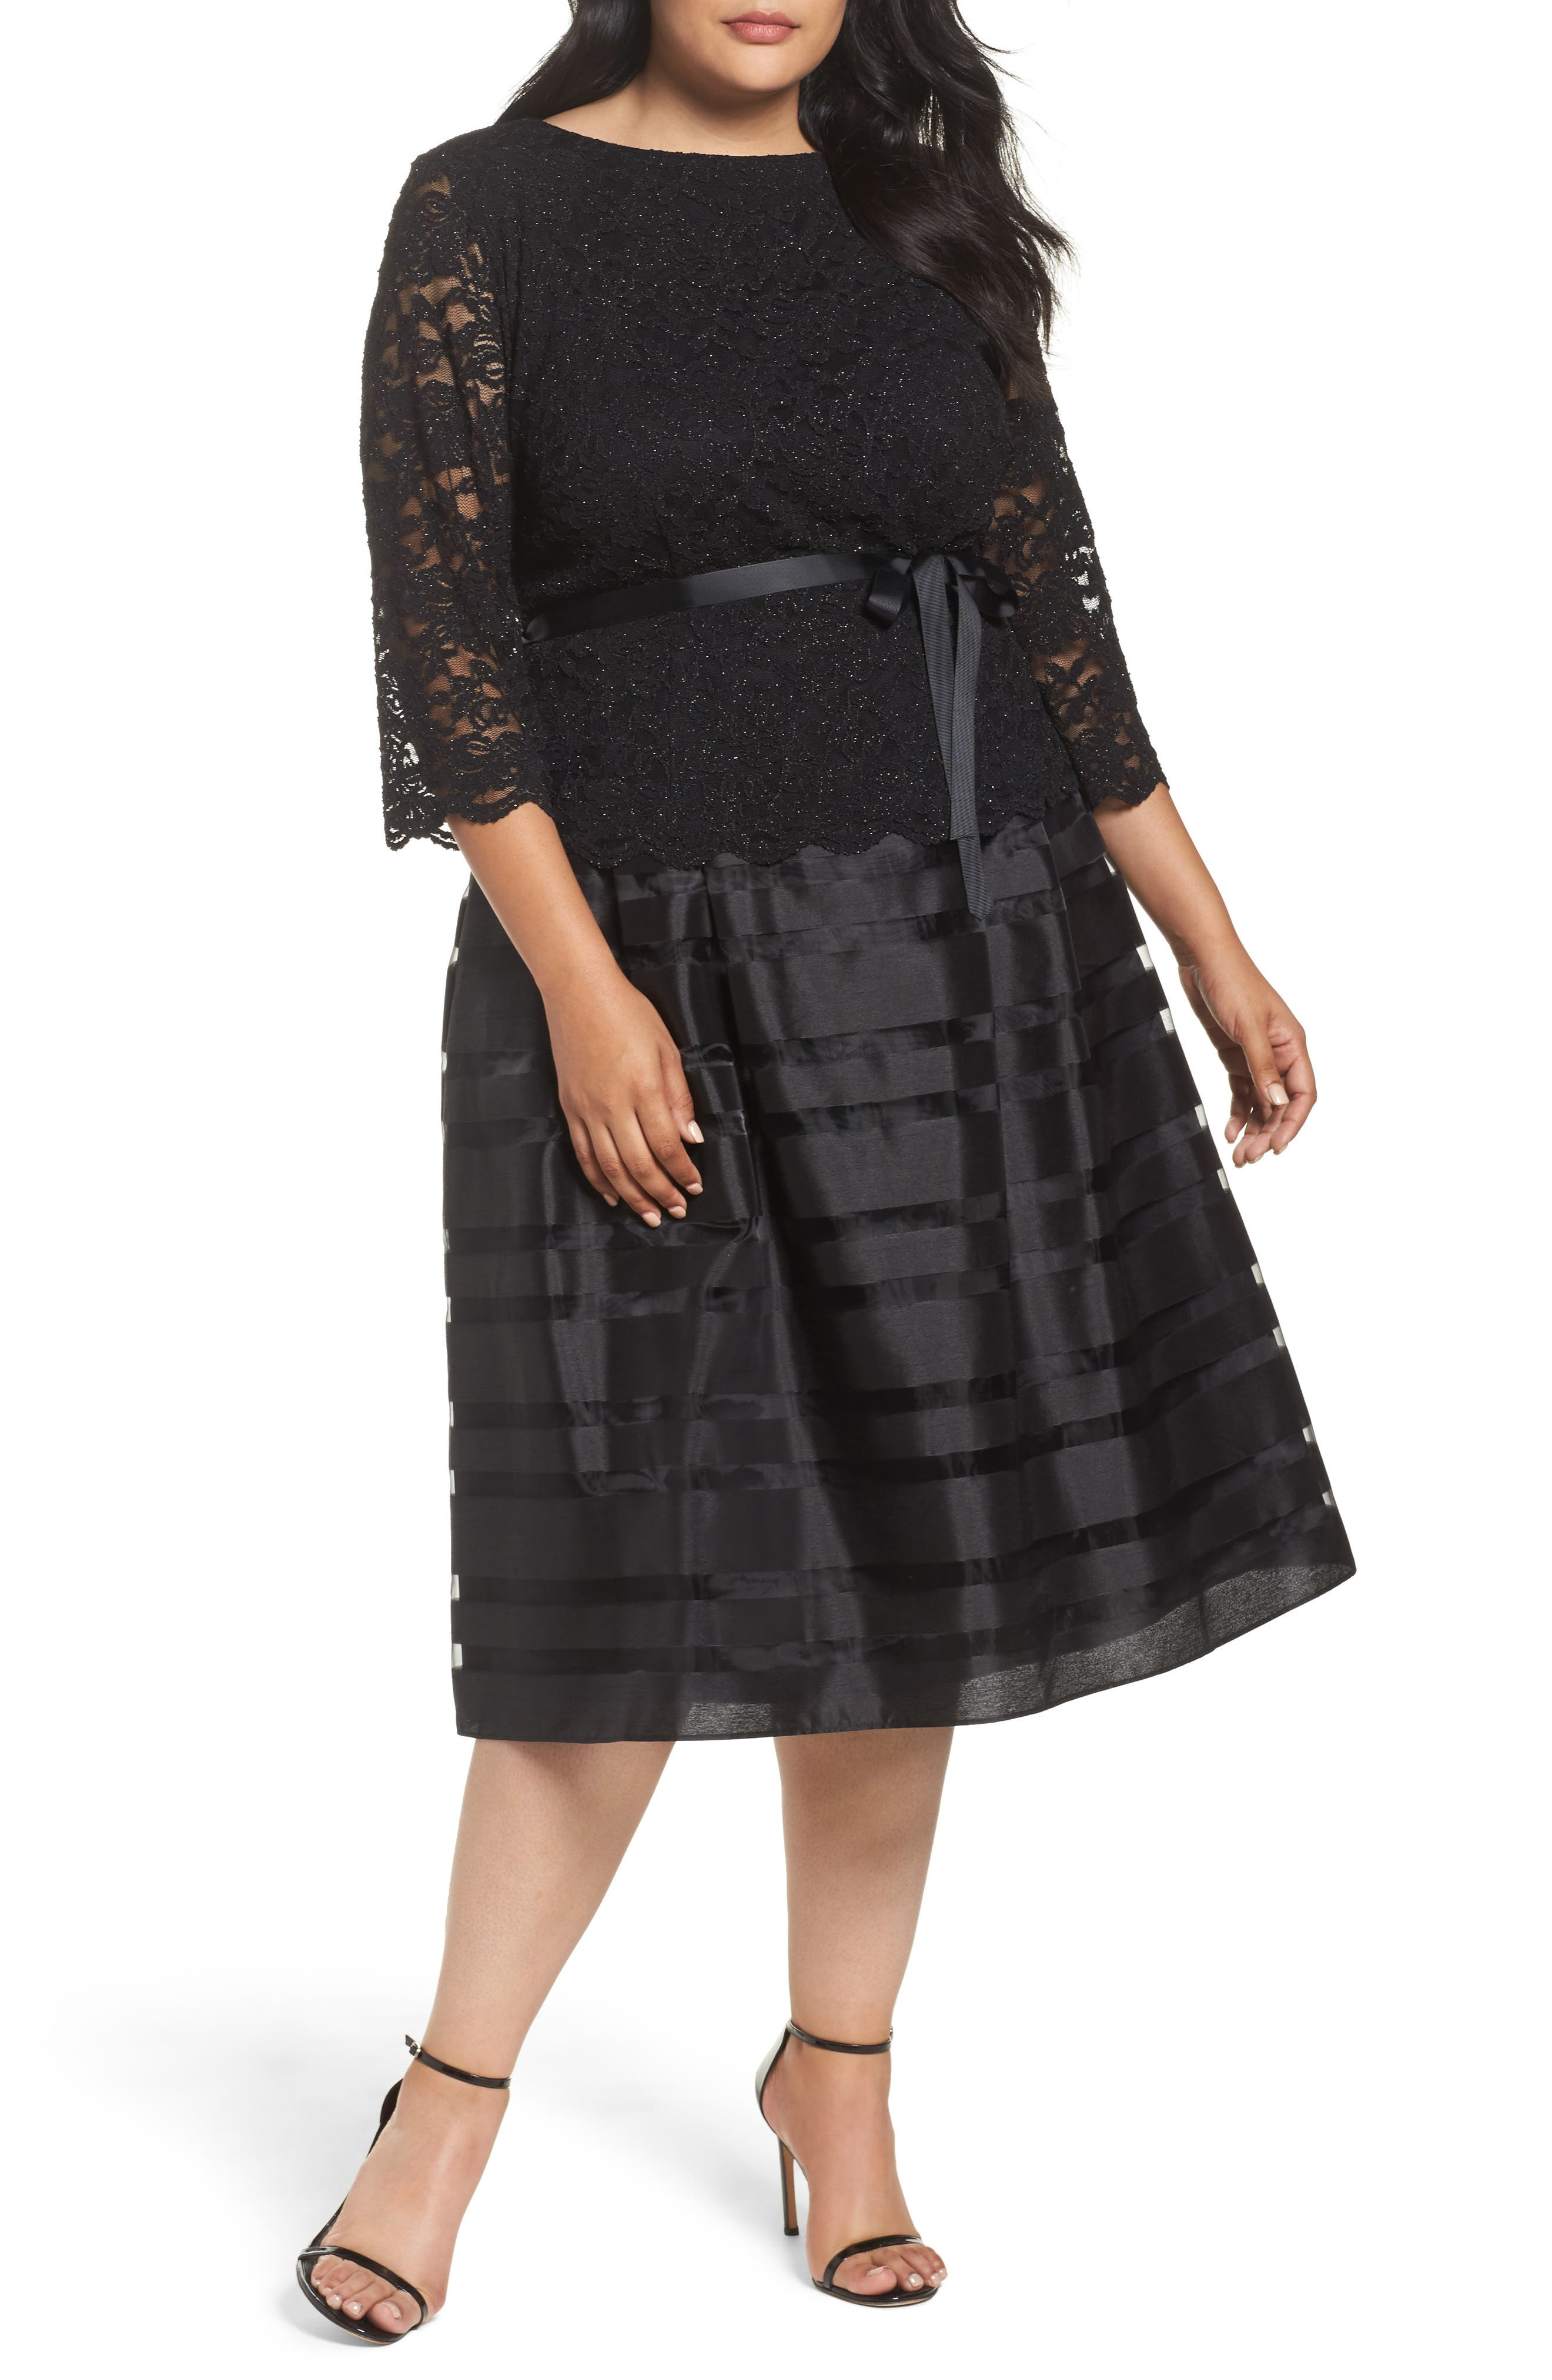 Alternate Image 1 Selected - Alex Evenings Mock Two-Piece A-Line Midi Dress (Plus Size)